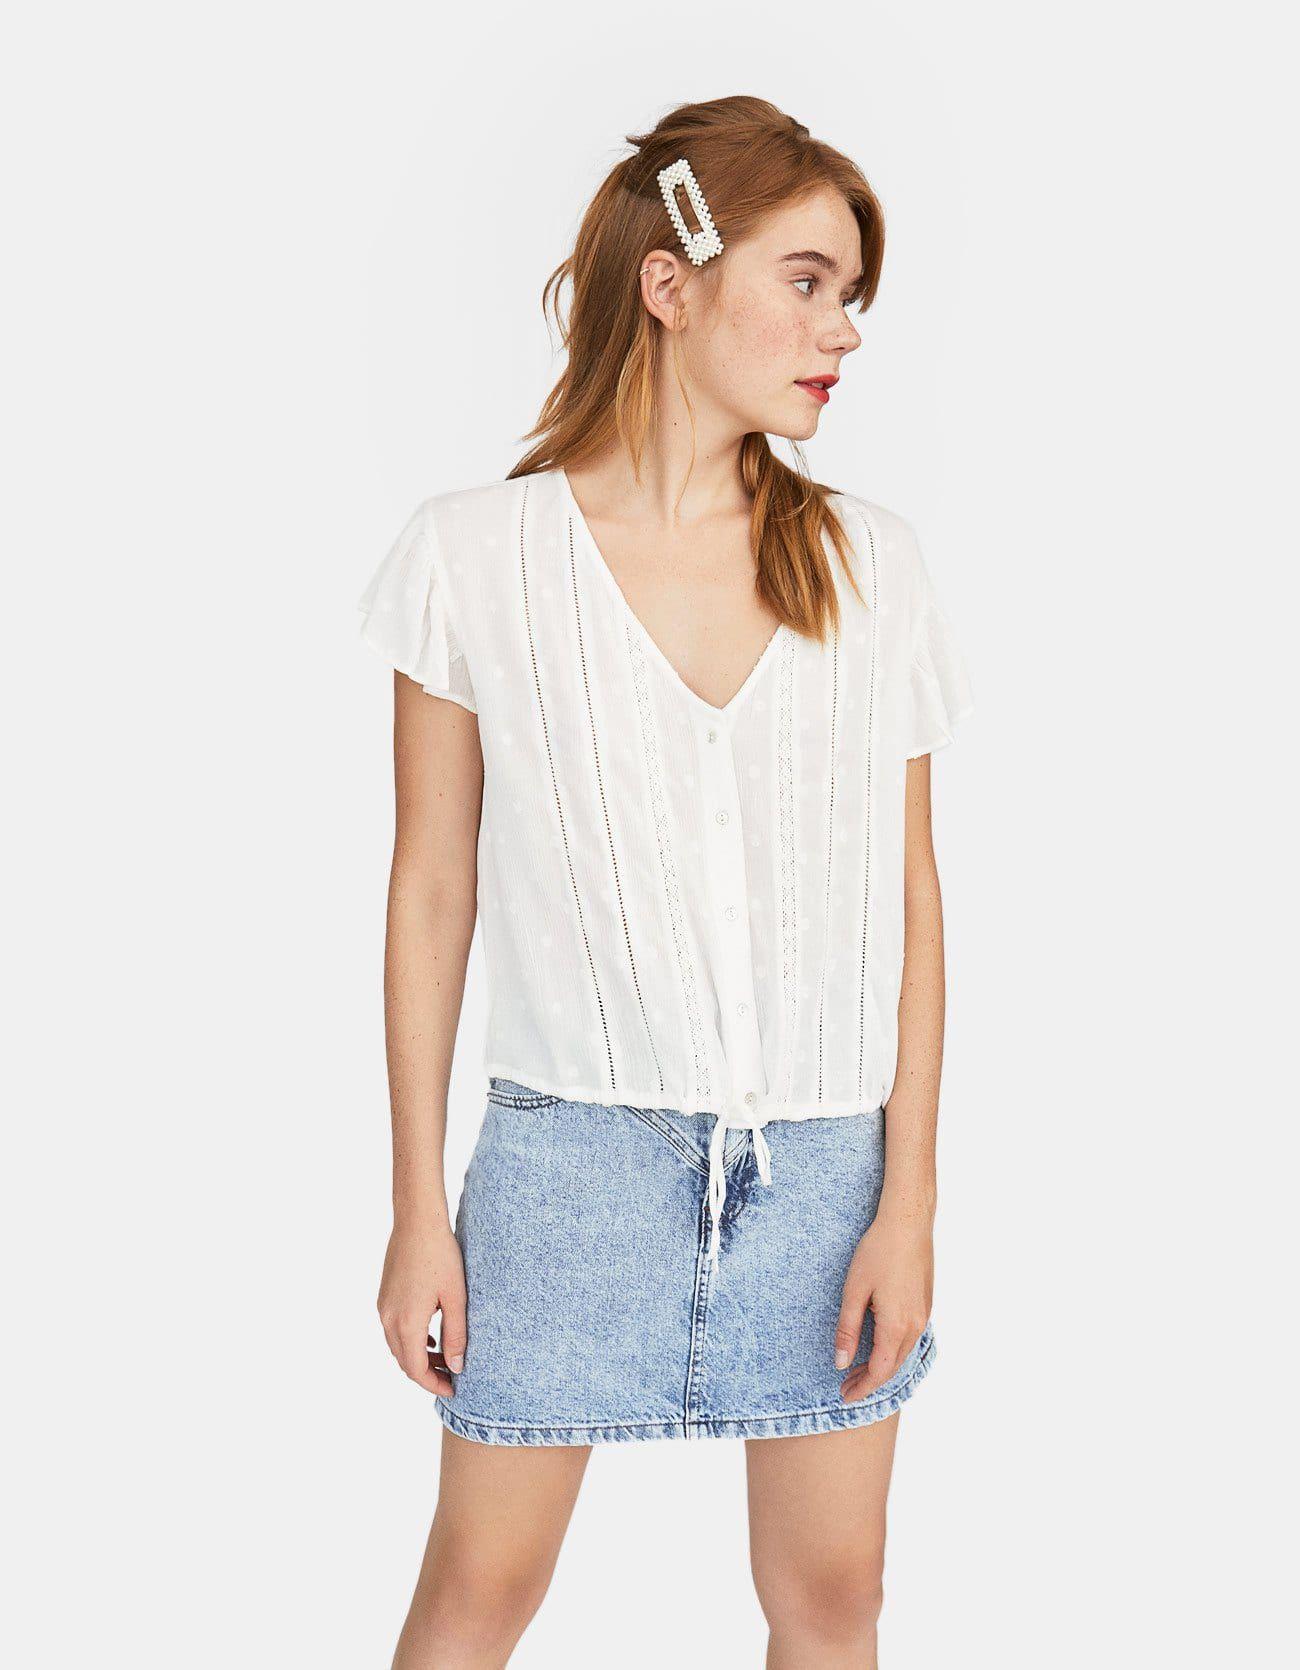 Esta es la camisa blanca de Stradivarius de 18 € con manga